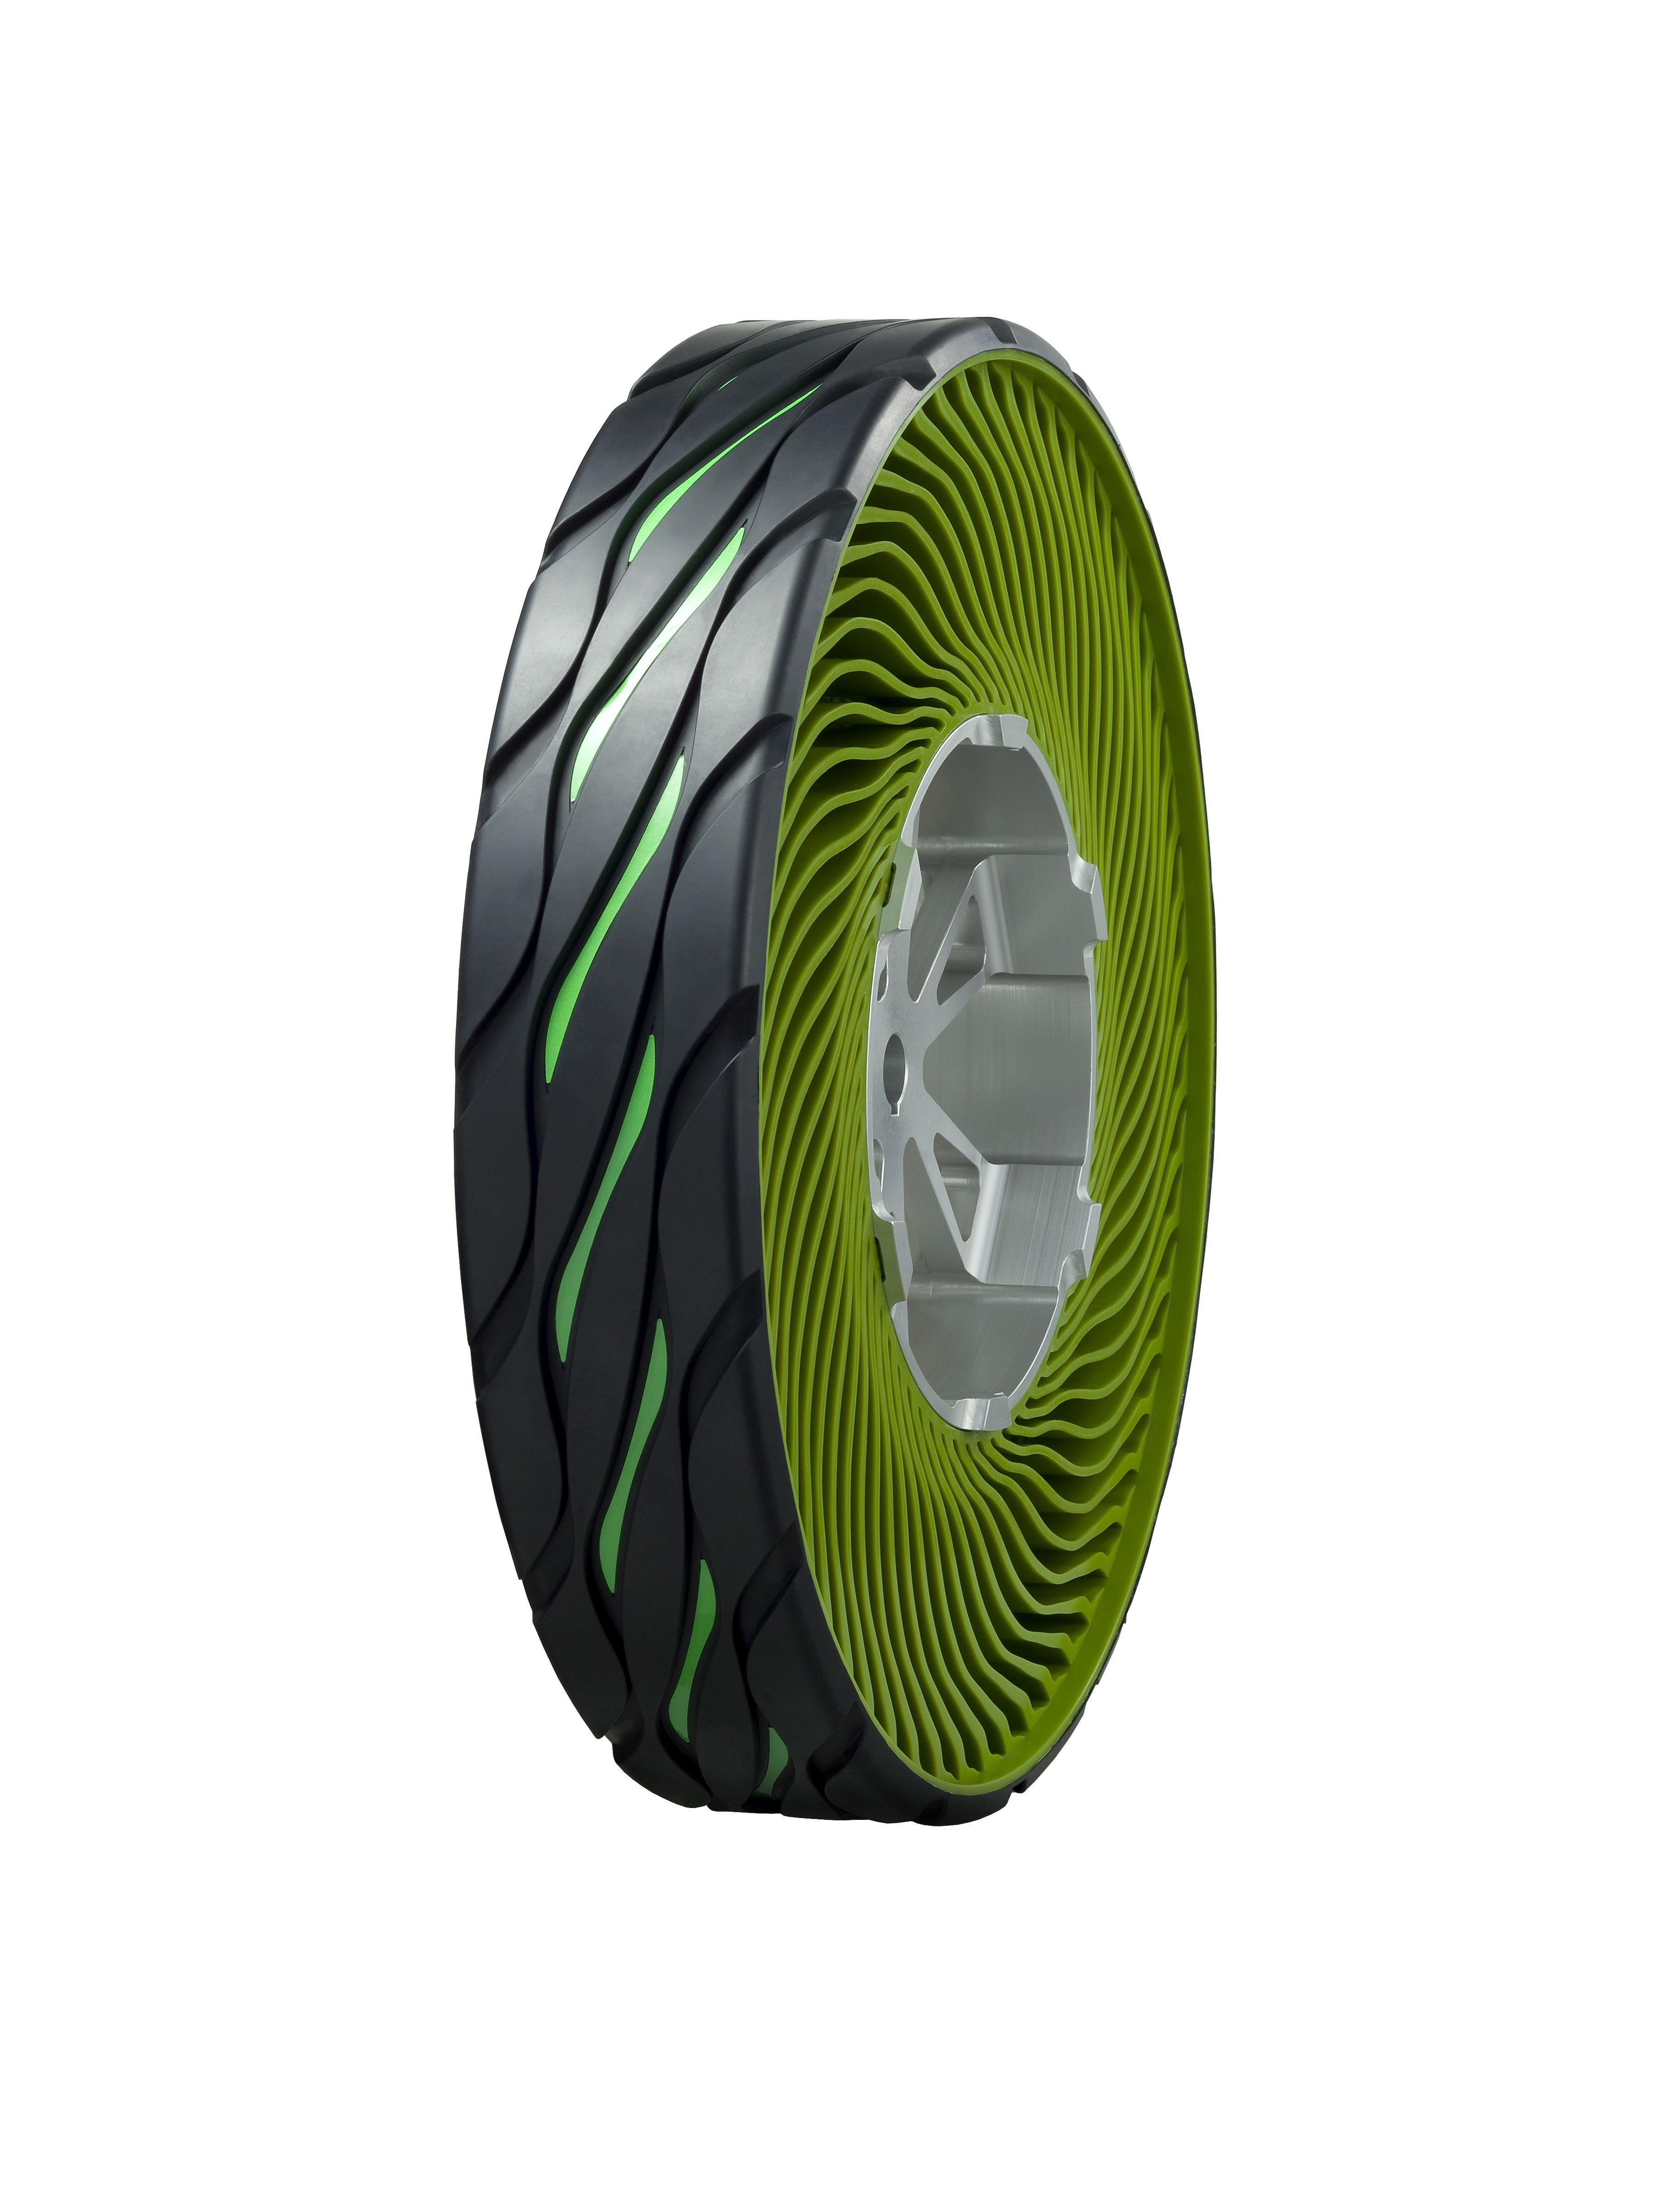 Bridgestone's airless tire features resin spokes